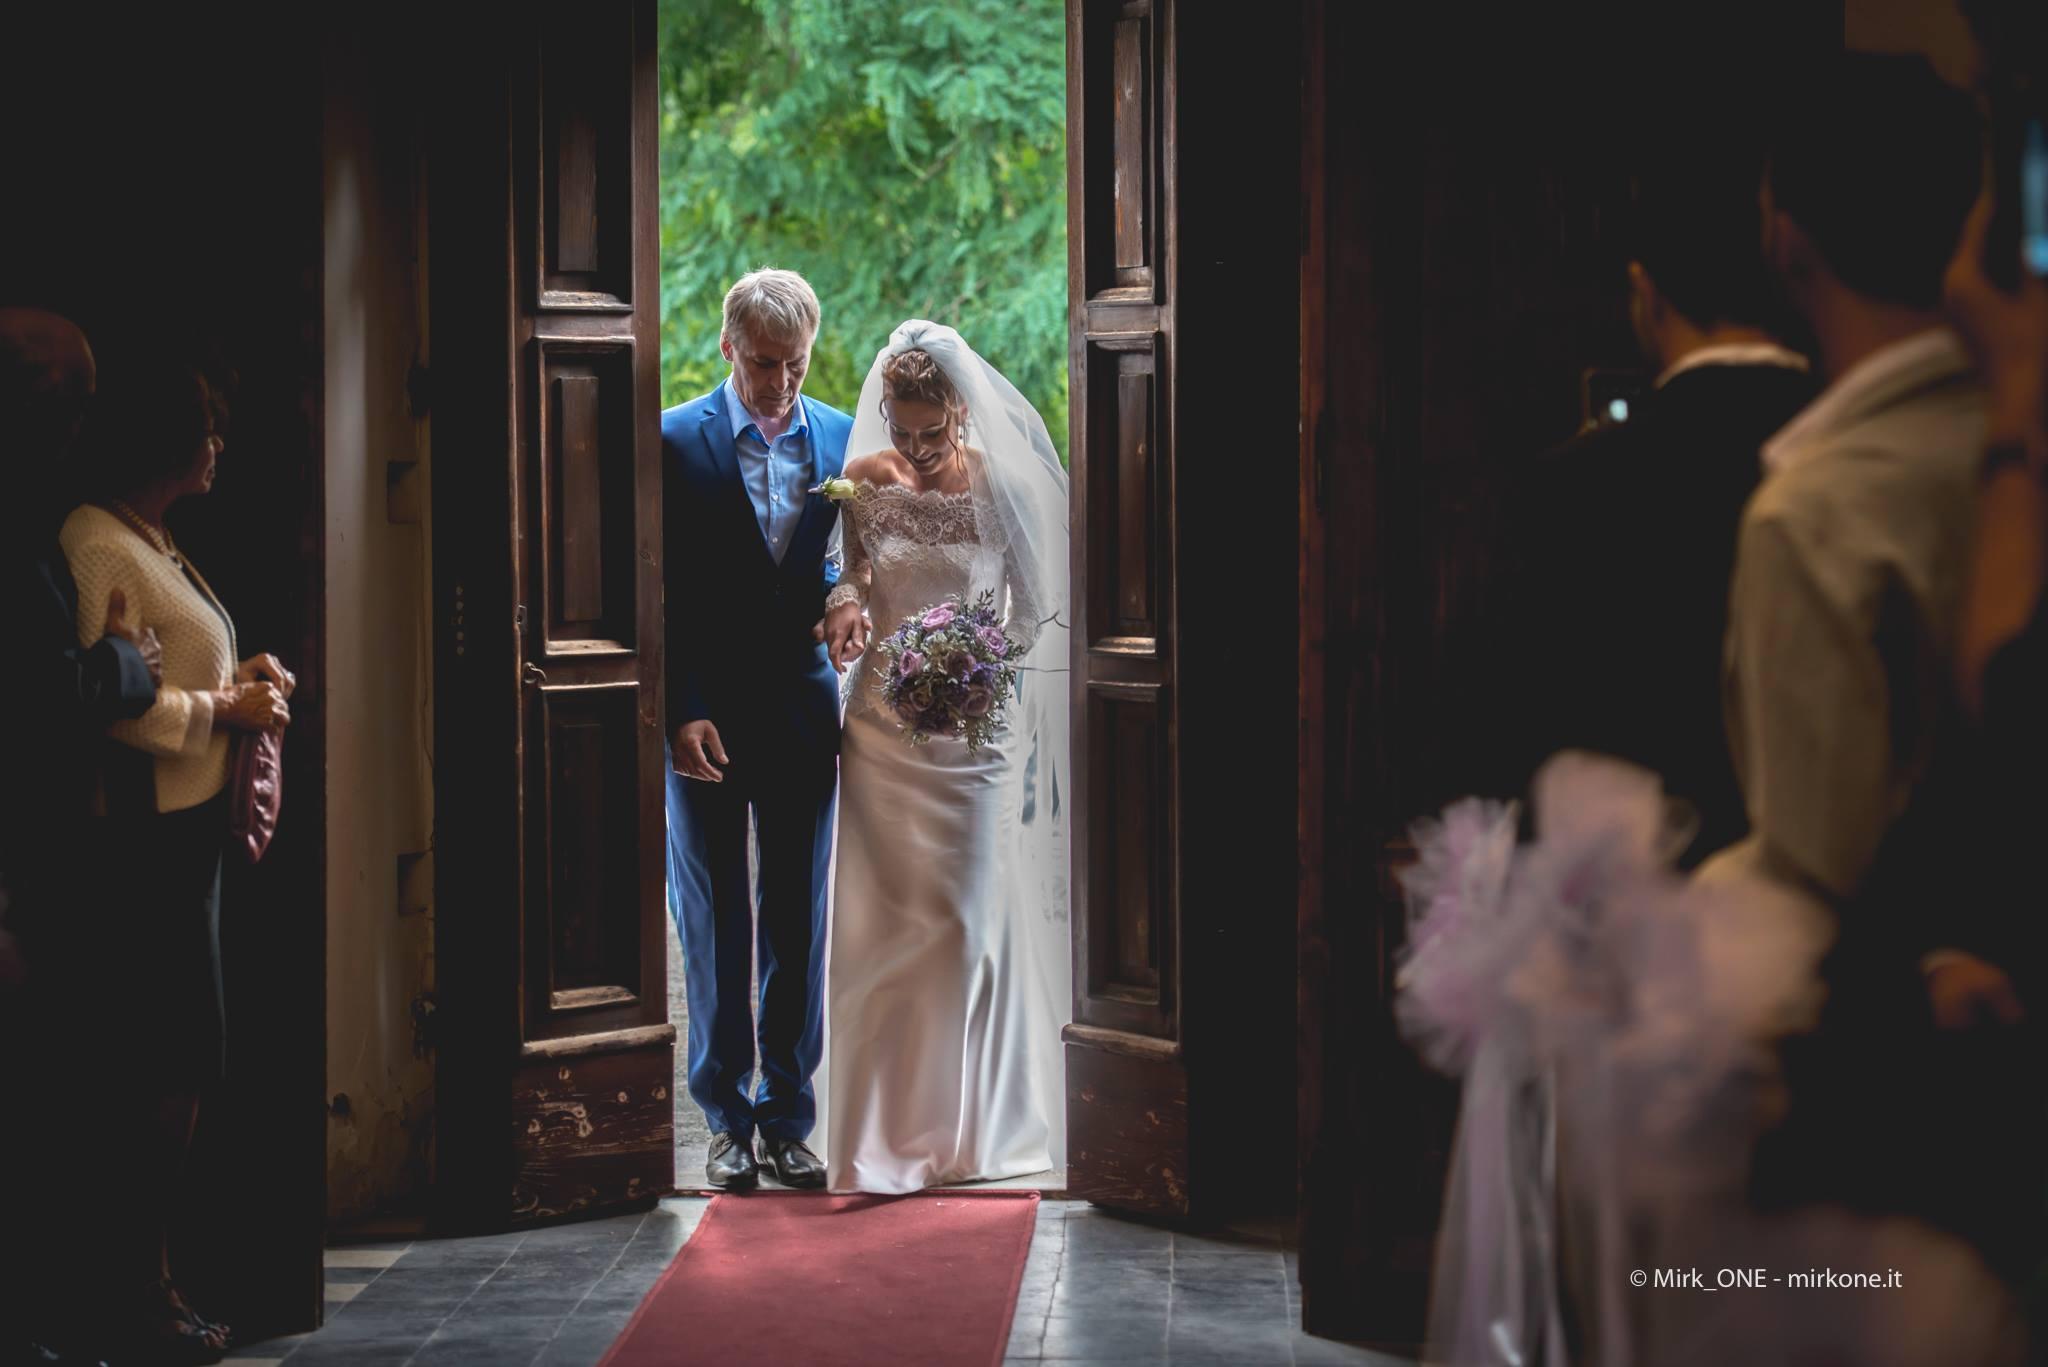 https://lnx.mirkone.it/wp-content/uploads/2015/07/mirk_ONE-fotografo-matrimonio-00125.jpg